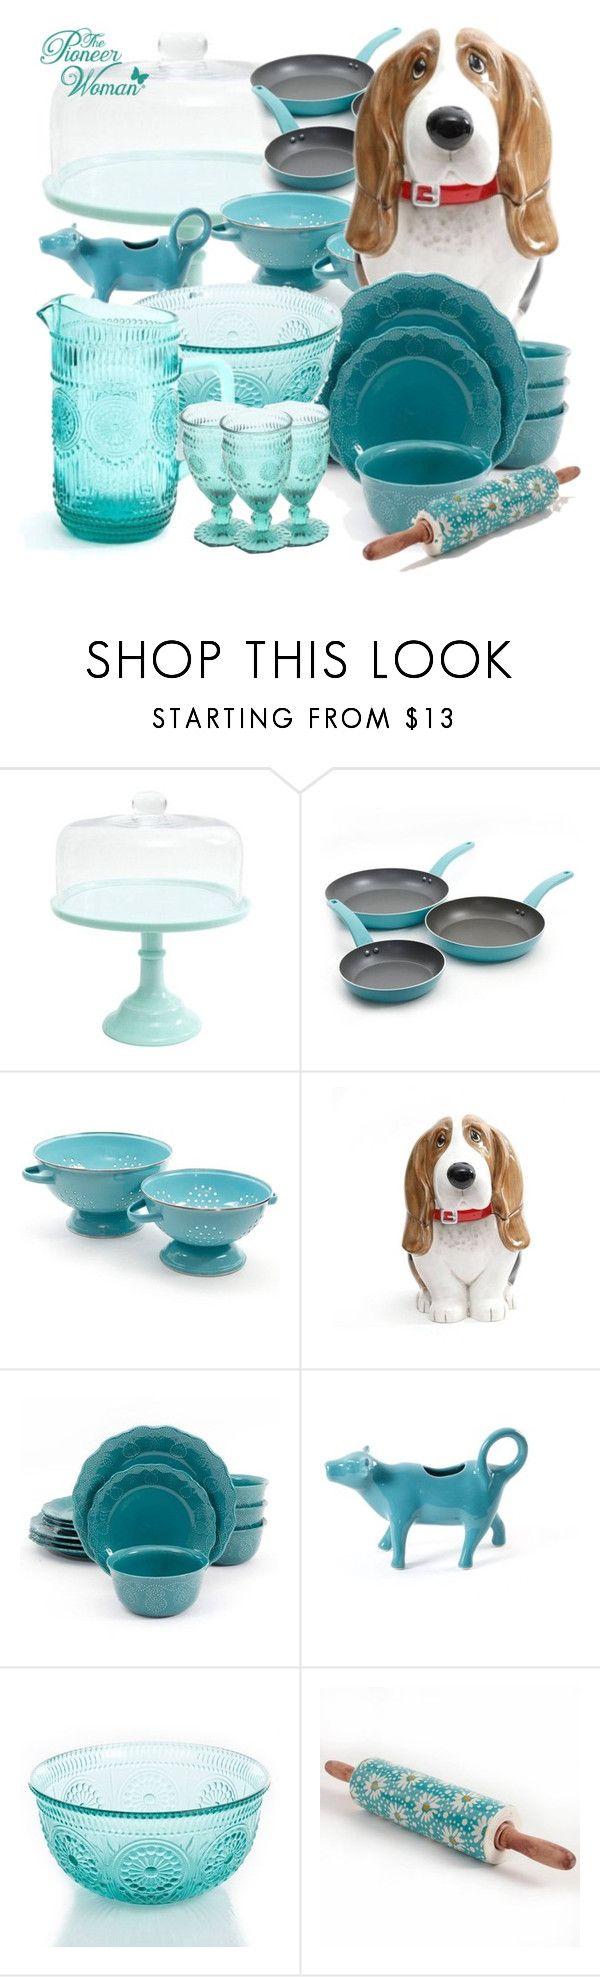 1023 best kitchen stuff images on Pinterest | Fabrics, Kitchen ...